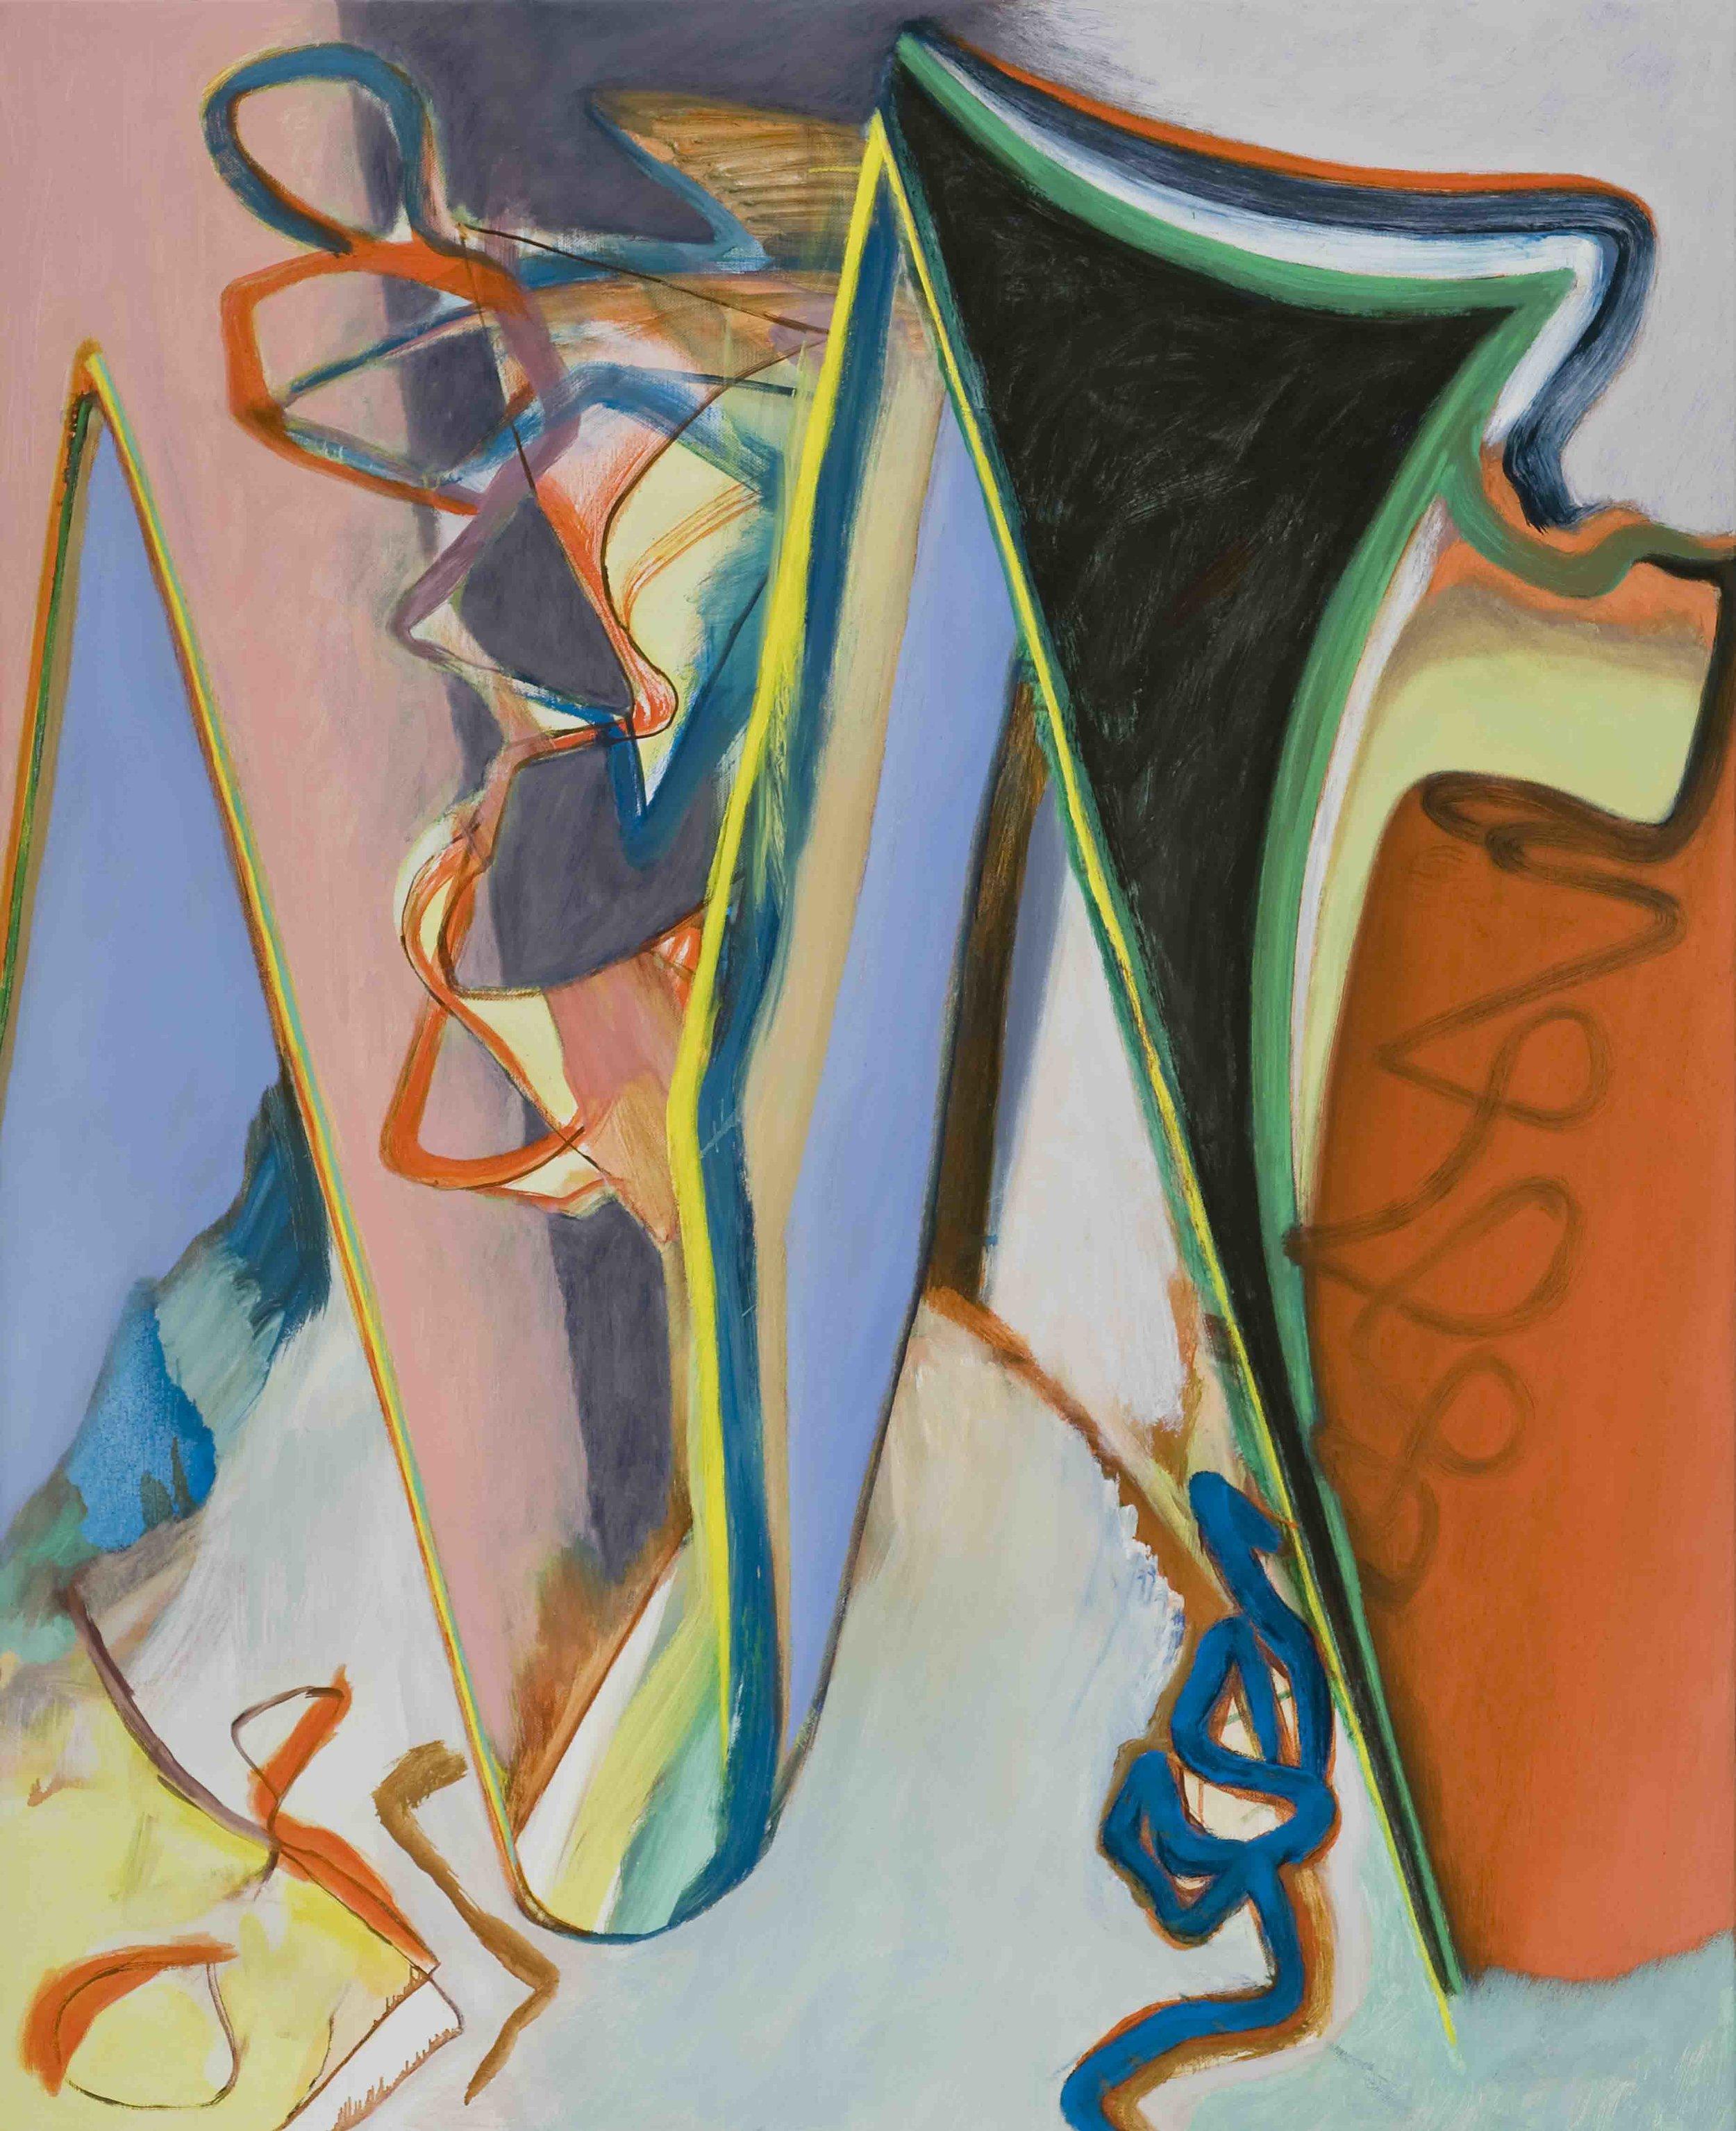 David Palliser, Somewhere Rolling , 2011, oil on canvas, 137 x 112cm